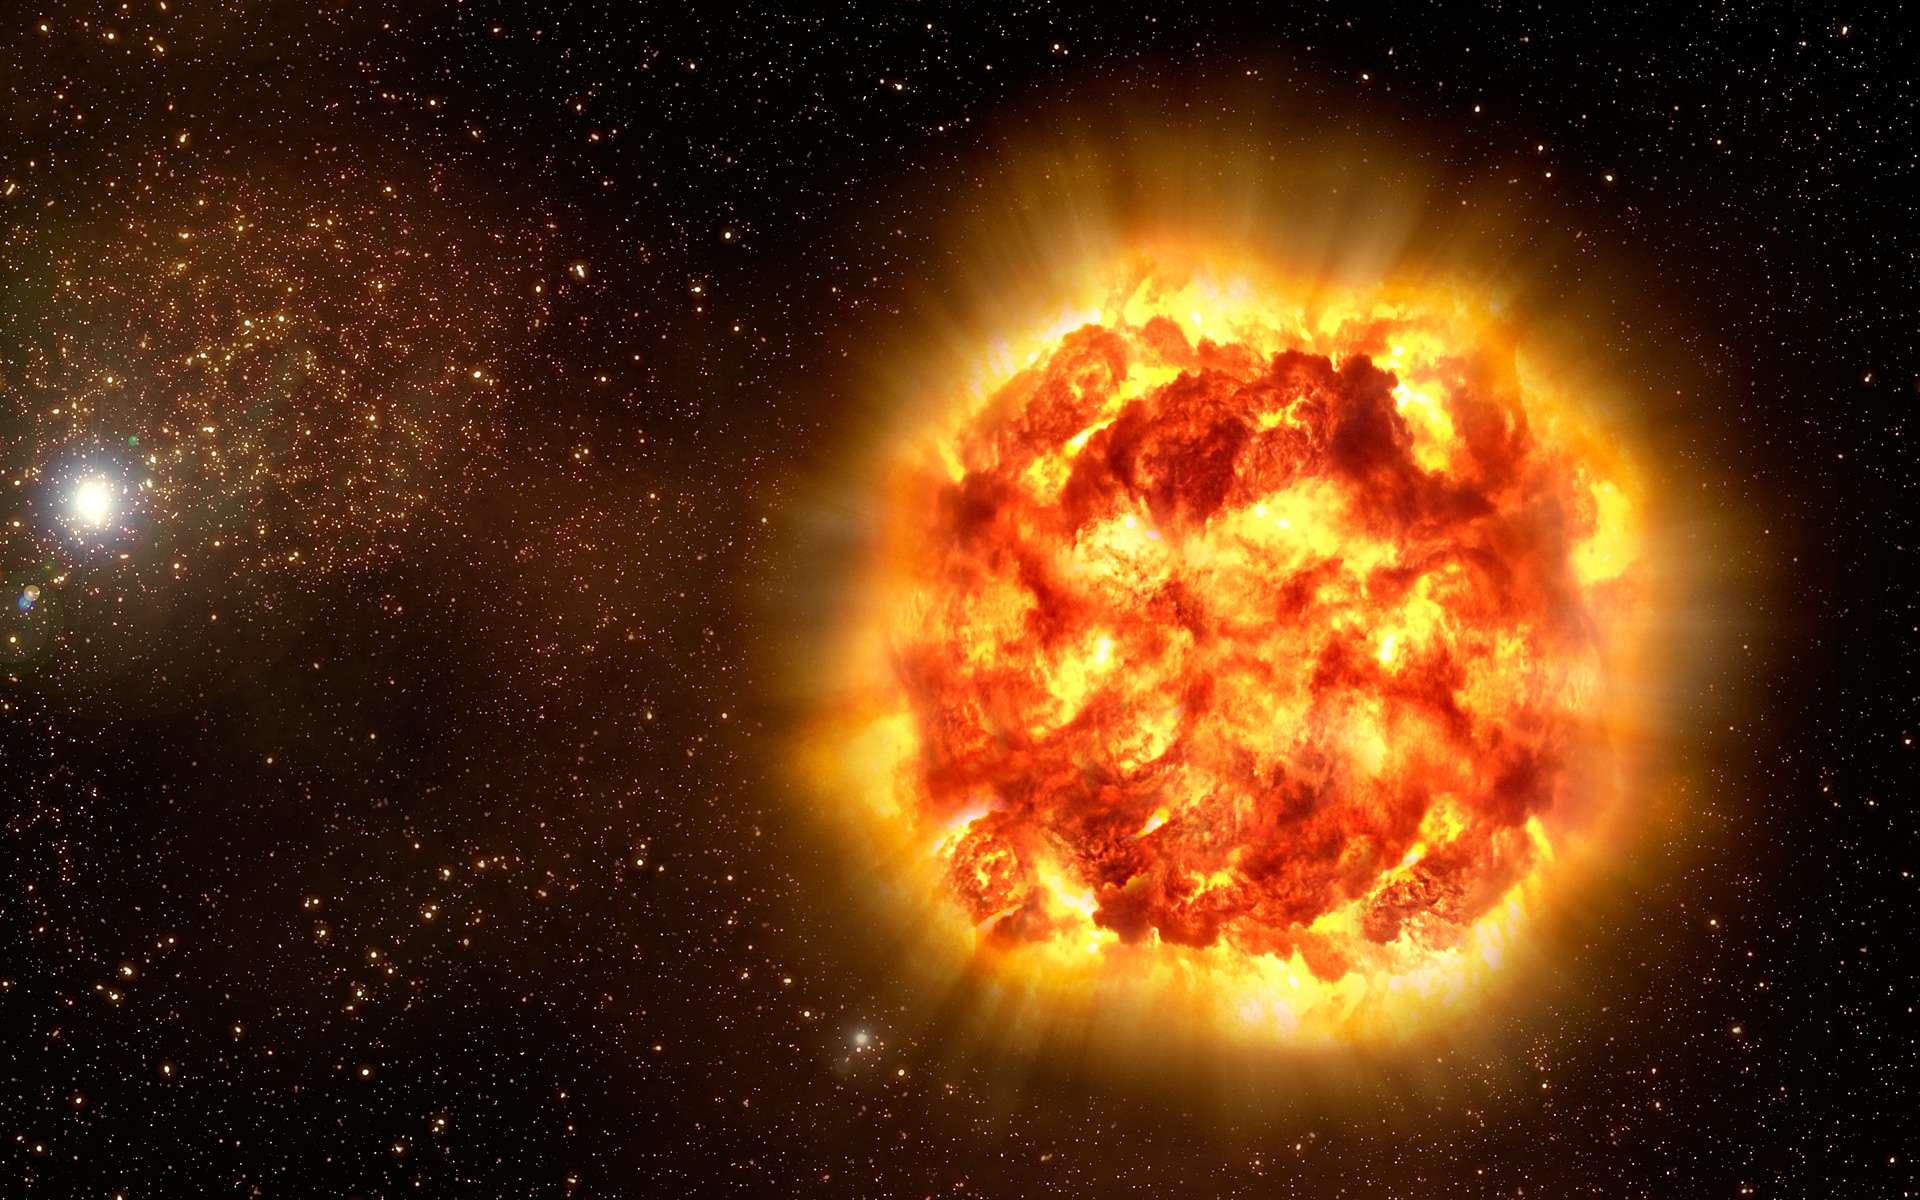 Une vue d'artiste de la supernova SN 2013fs. © ESO